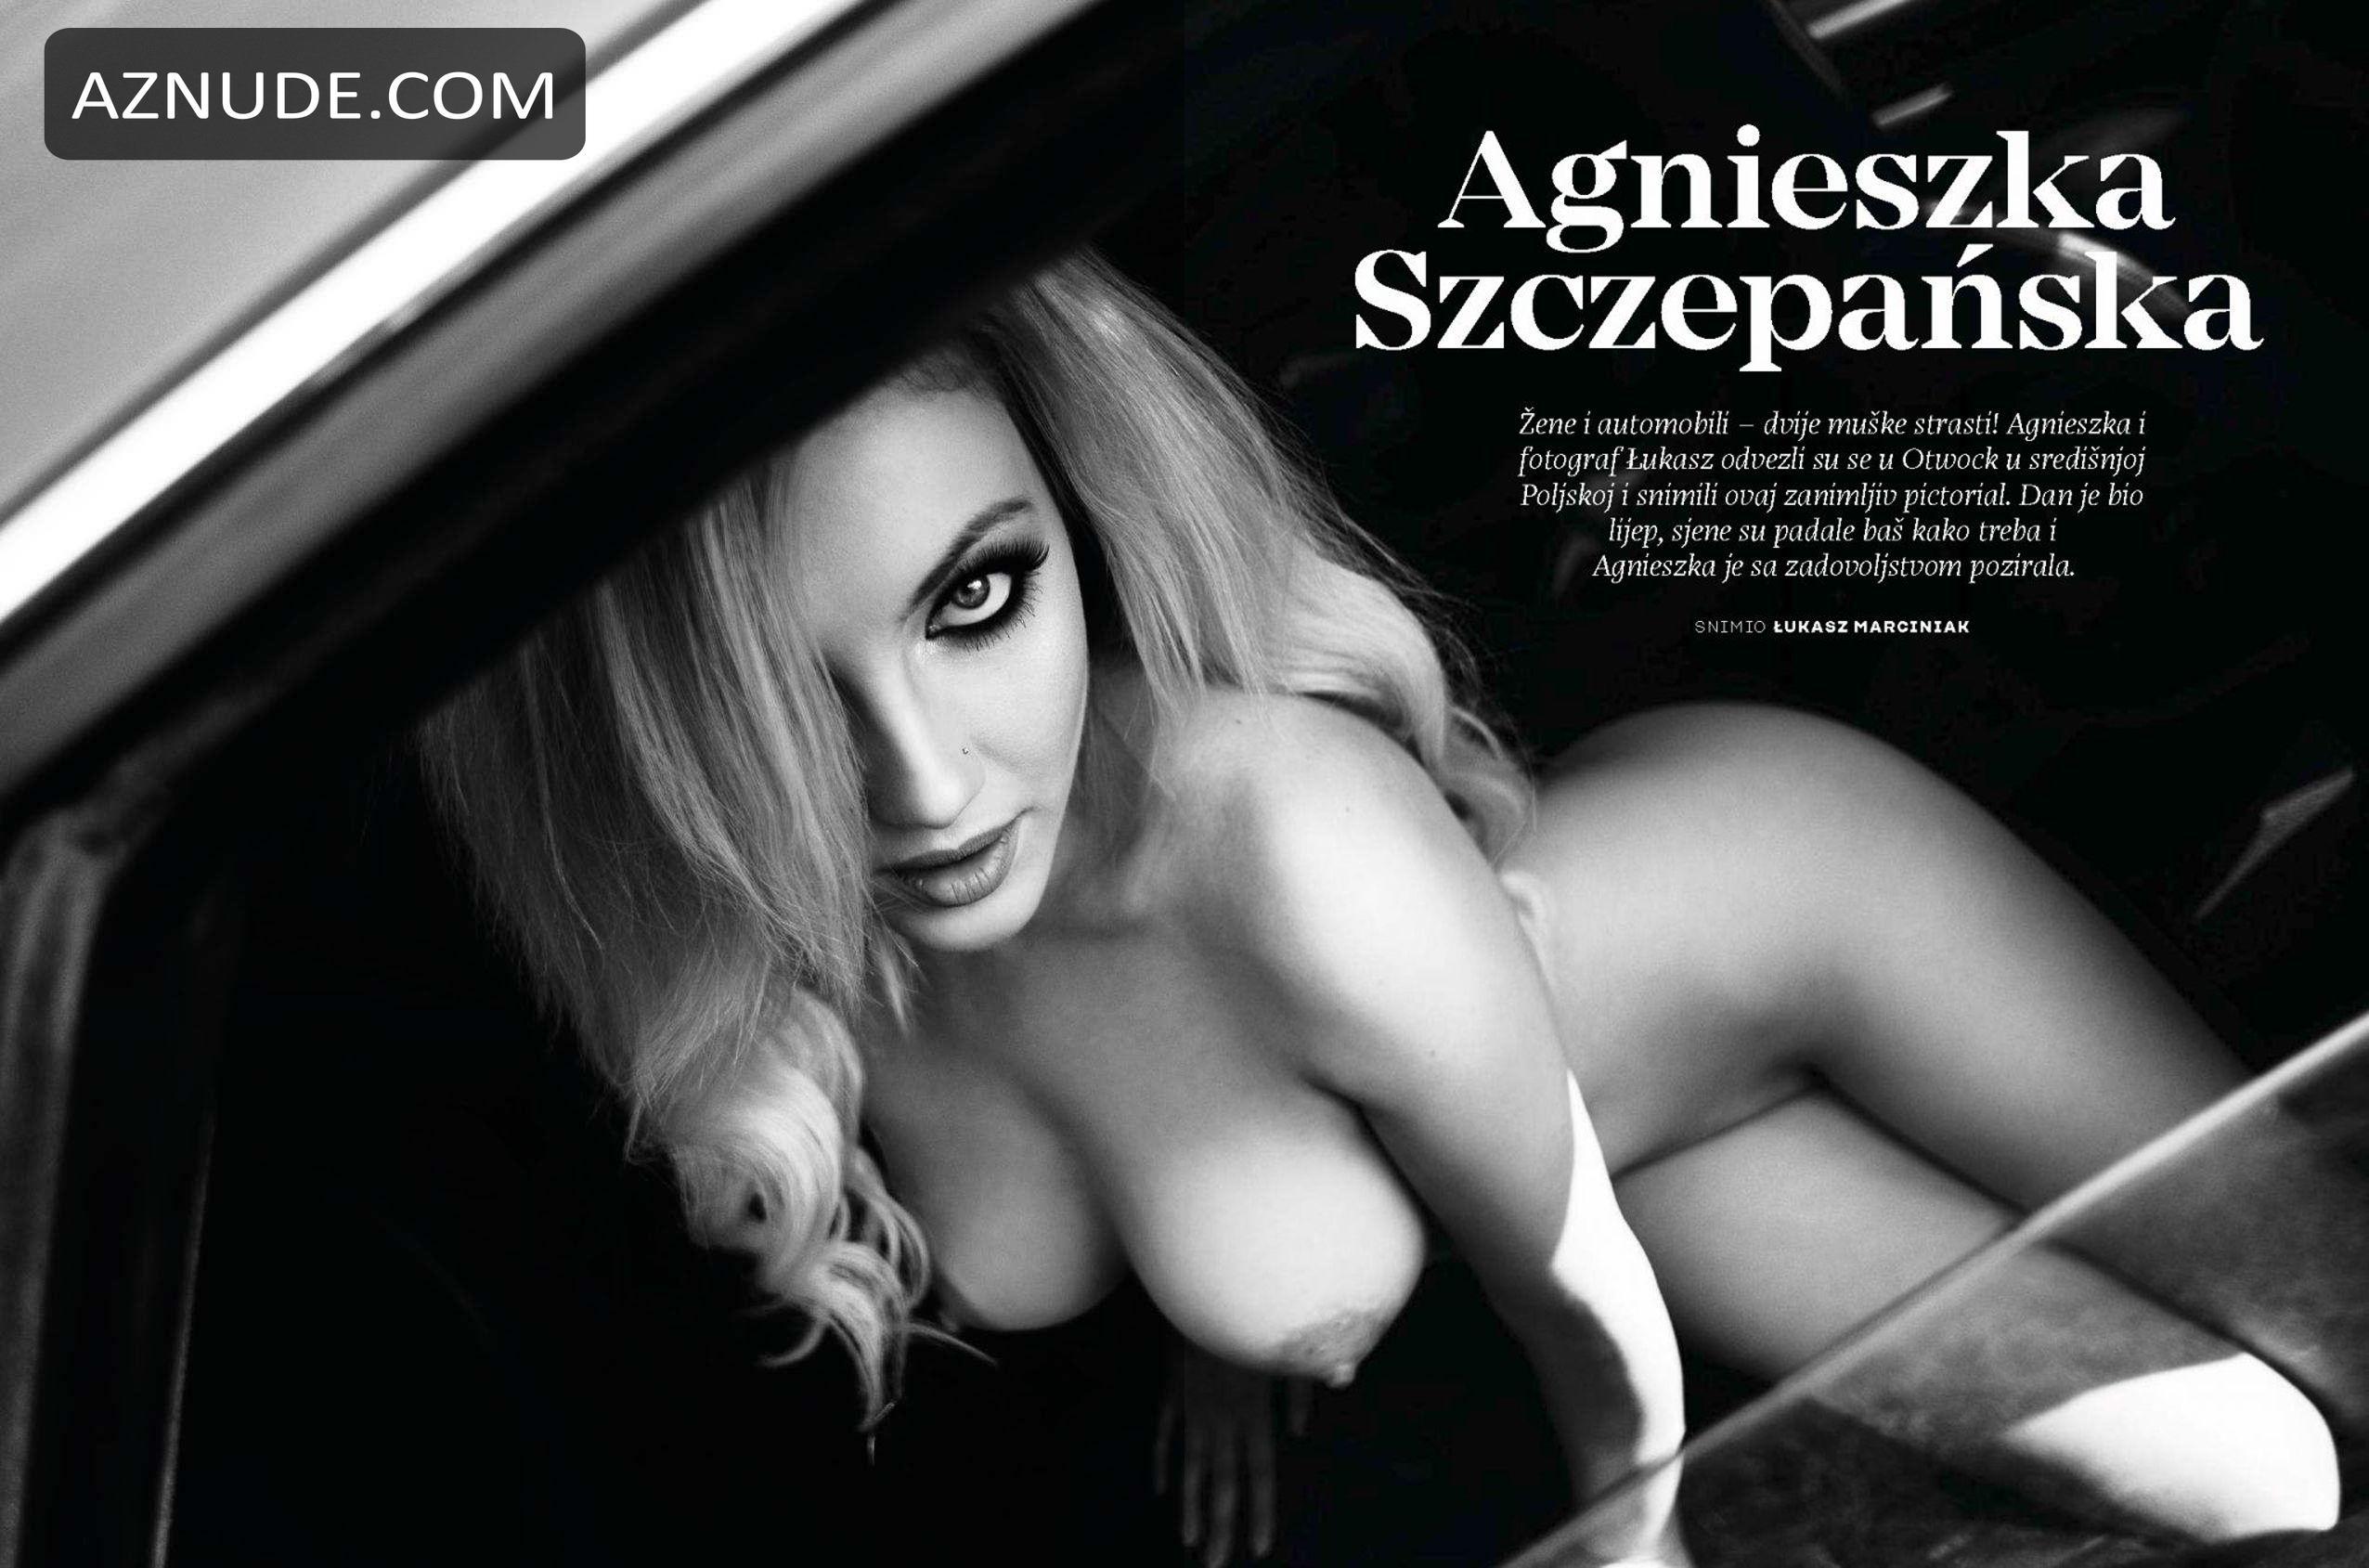 Boobs Sex Agnieszka Szczepanska naked photo 2017